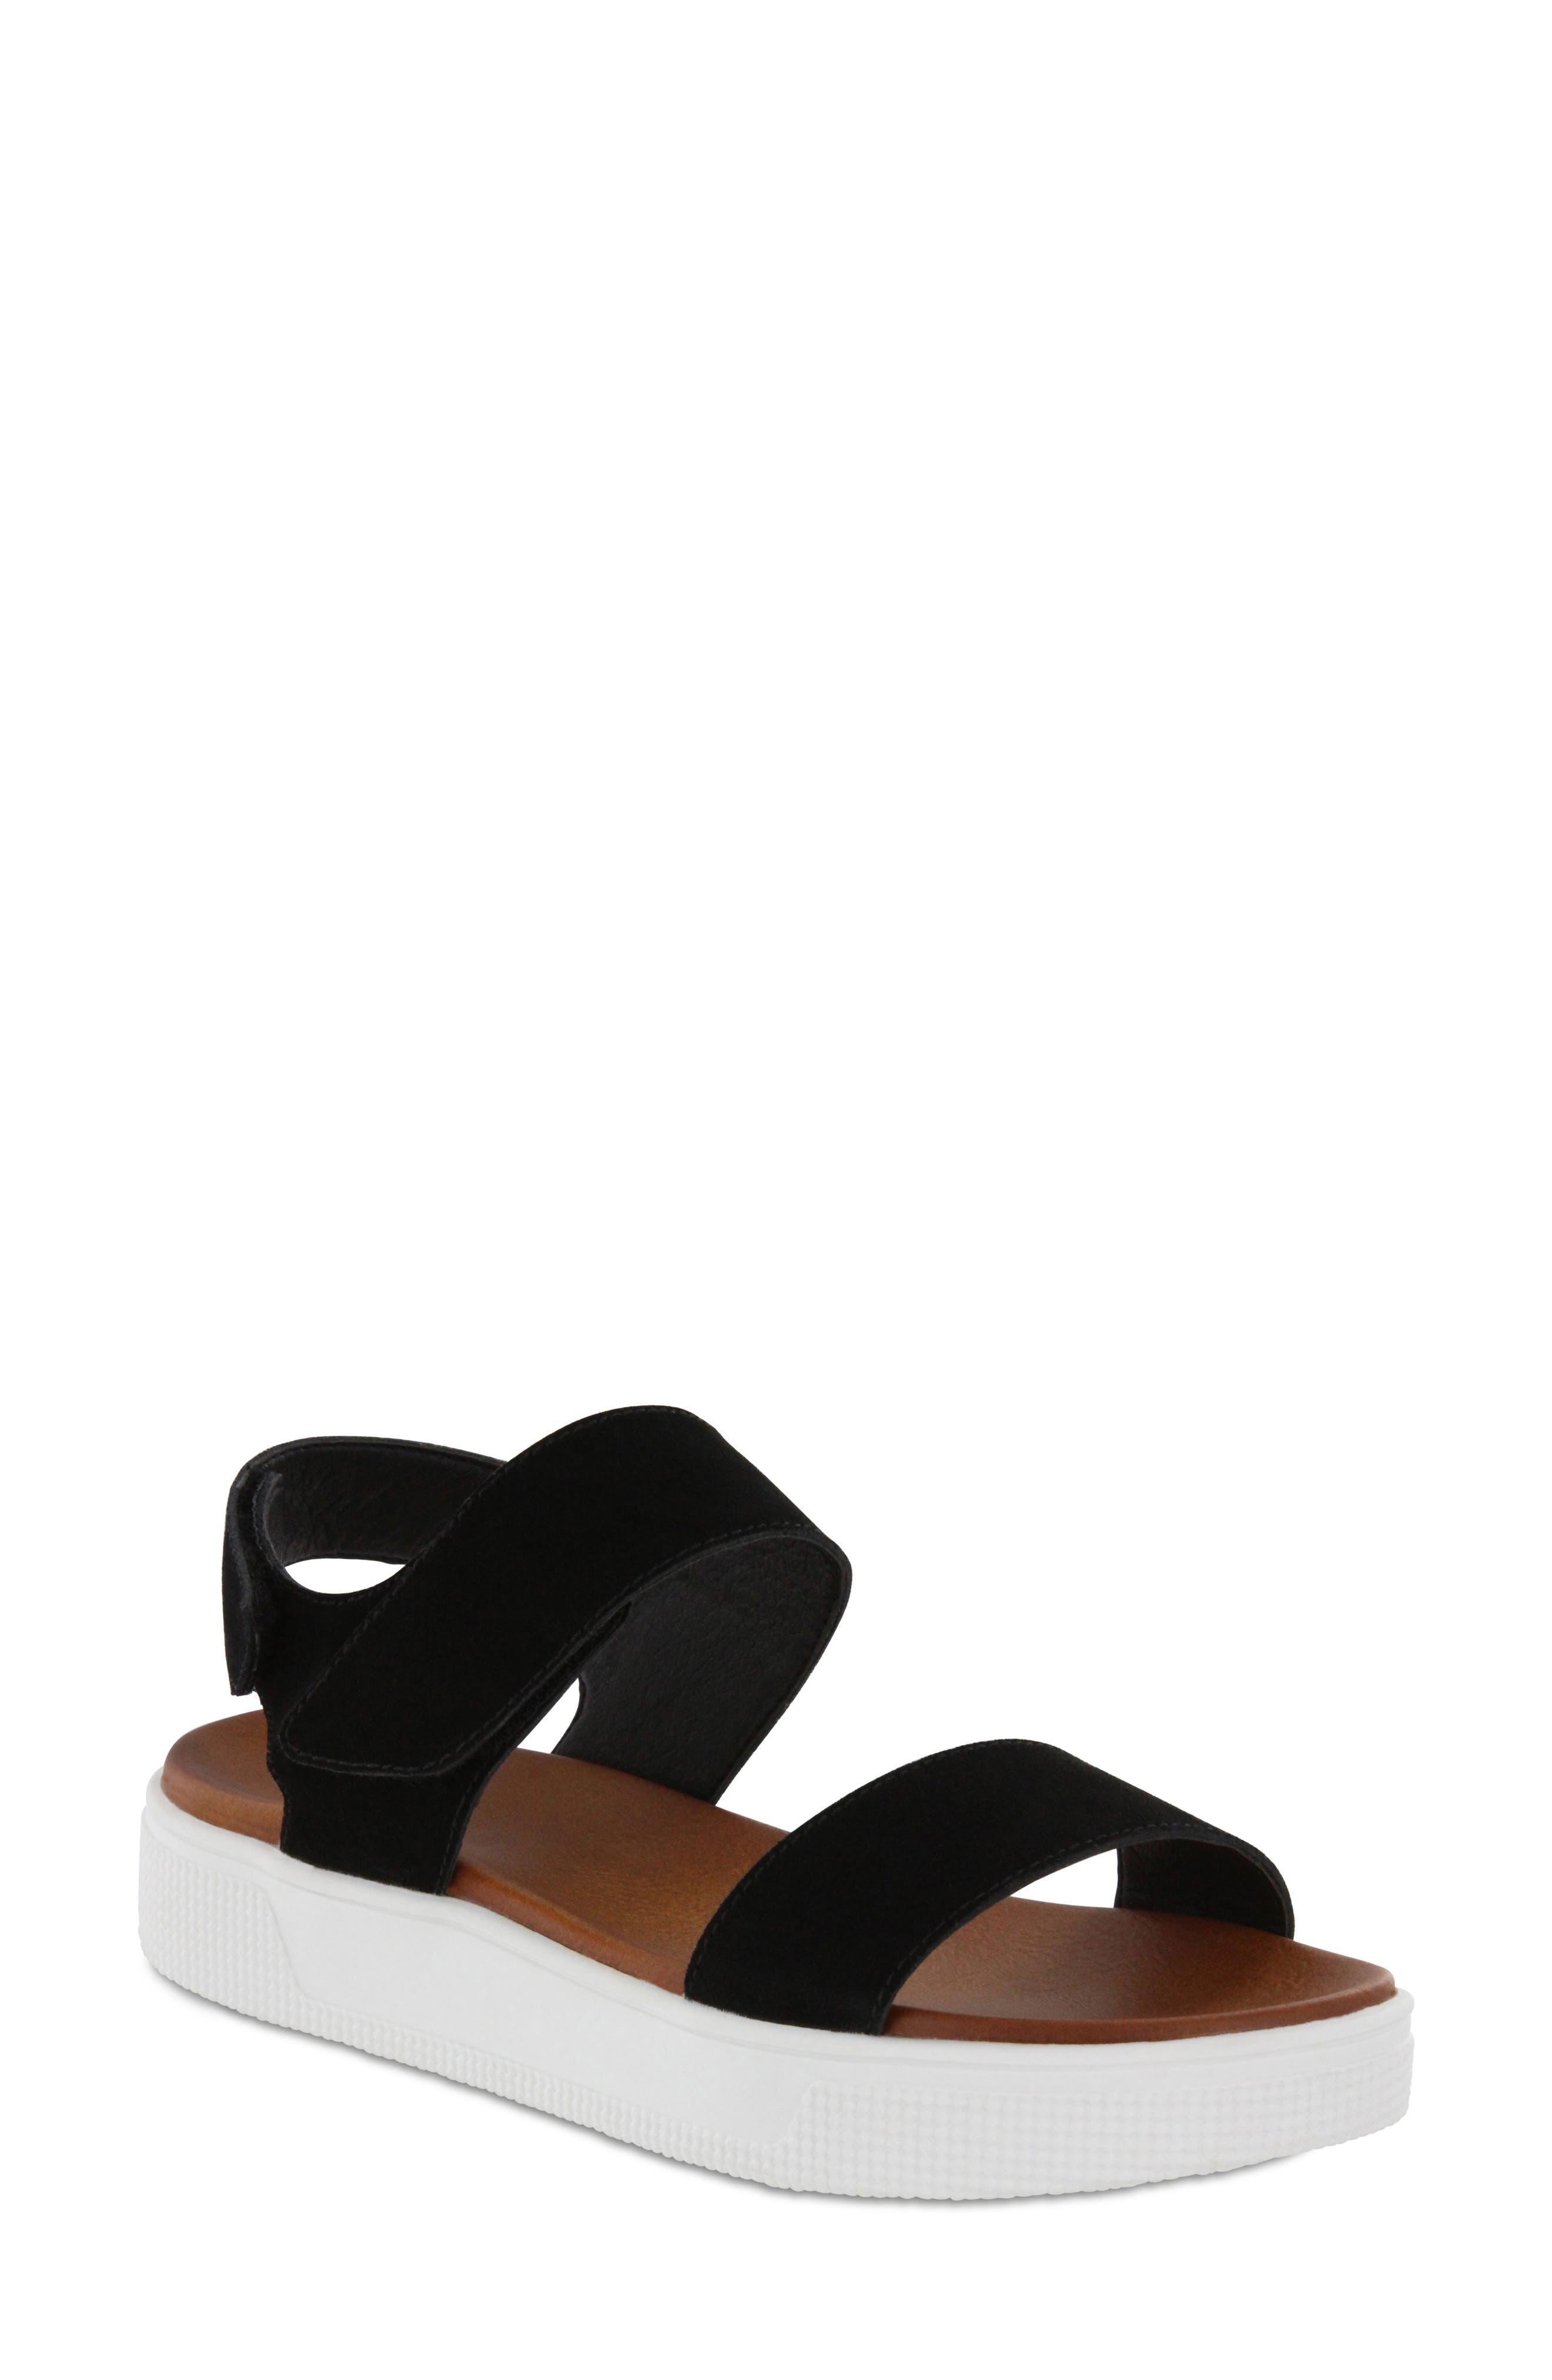 Troy Slingback Platform Sandal,                             Main thumbnail 1, color,                             001